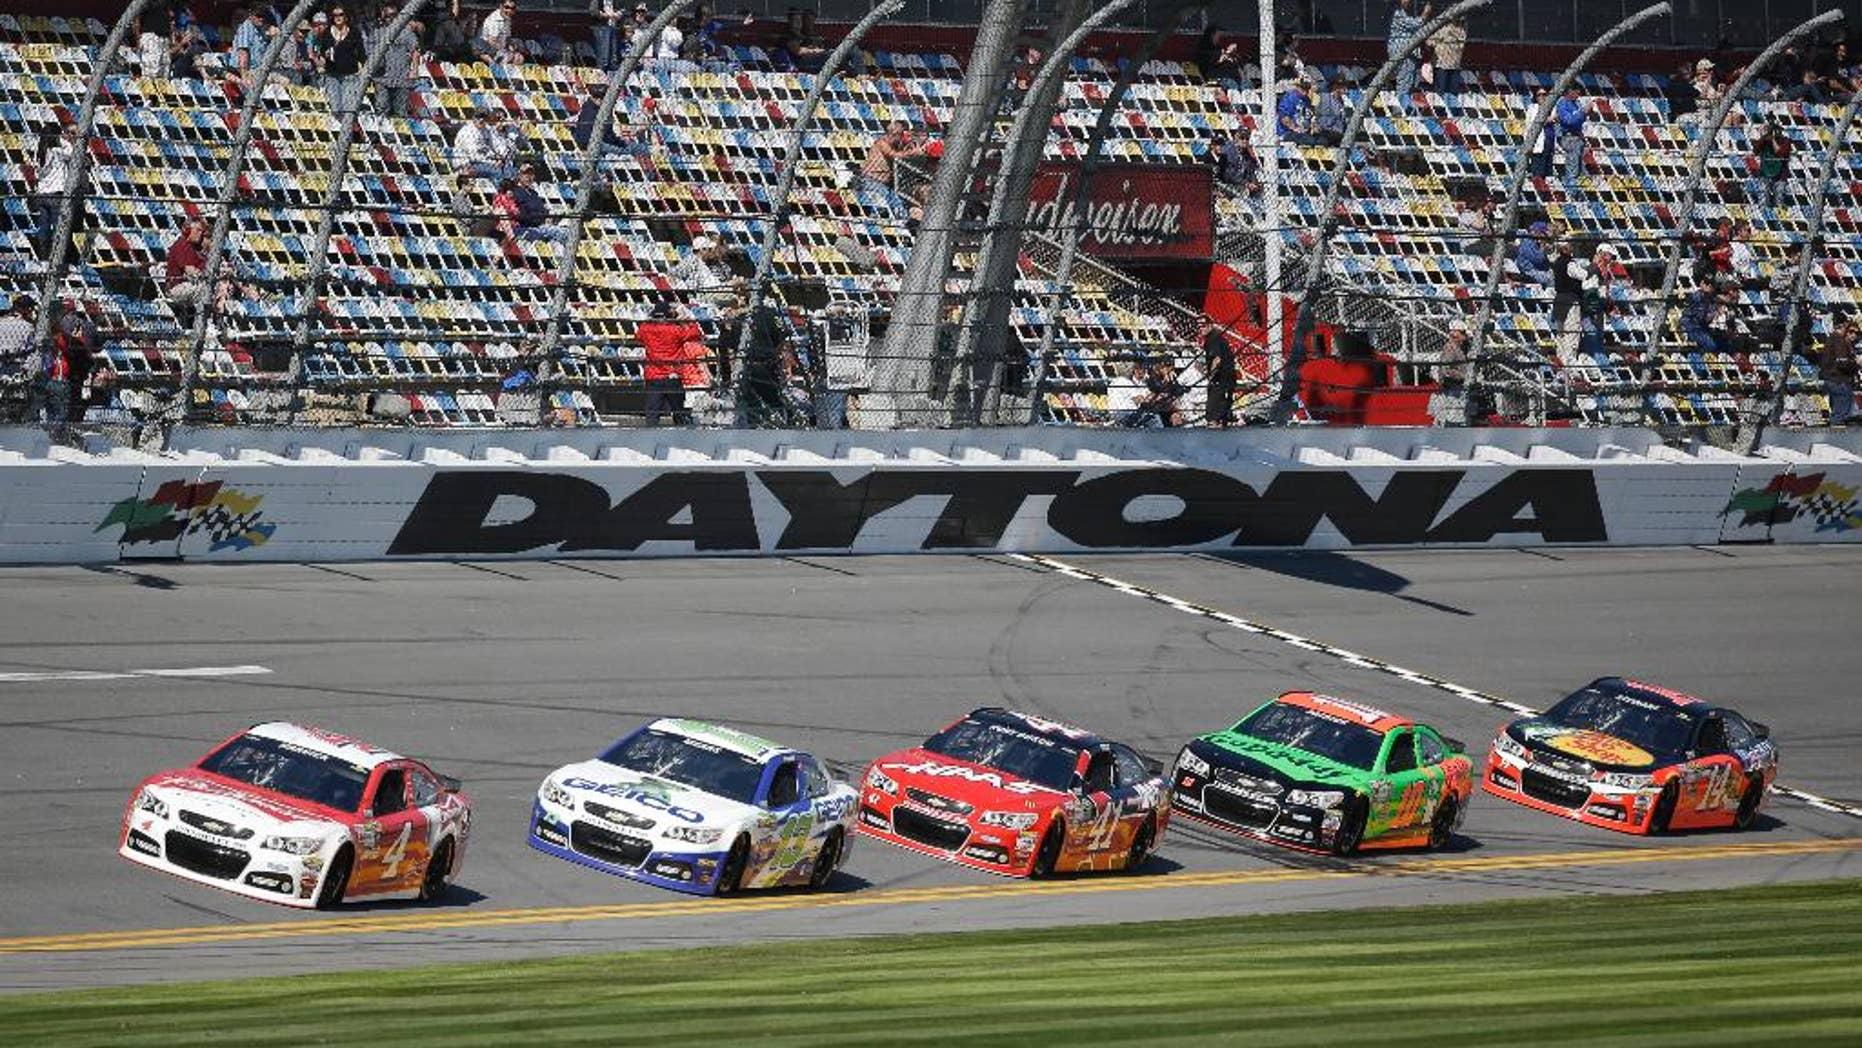 Cars qualifying for the Daytona 500 NASCAR Sprint Cup Series auto race, from left to right, Kevin Harvick (4), Casey Mears (13), Kurt Busch (41), Danica Patrick (10) and Tony Stewart (14) runs laps at Daytona International Speedway, Sunday, Feb. 15, 2015, in Daytona Beach, Fla. (AP Photo/John Raoux)